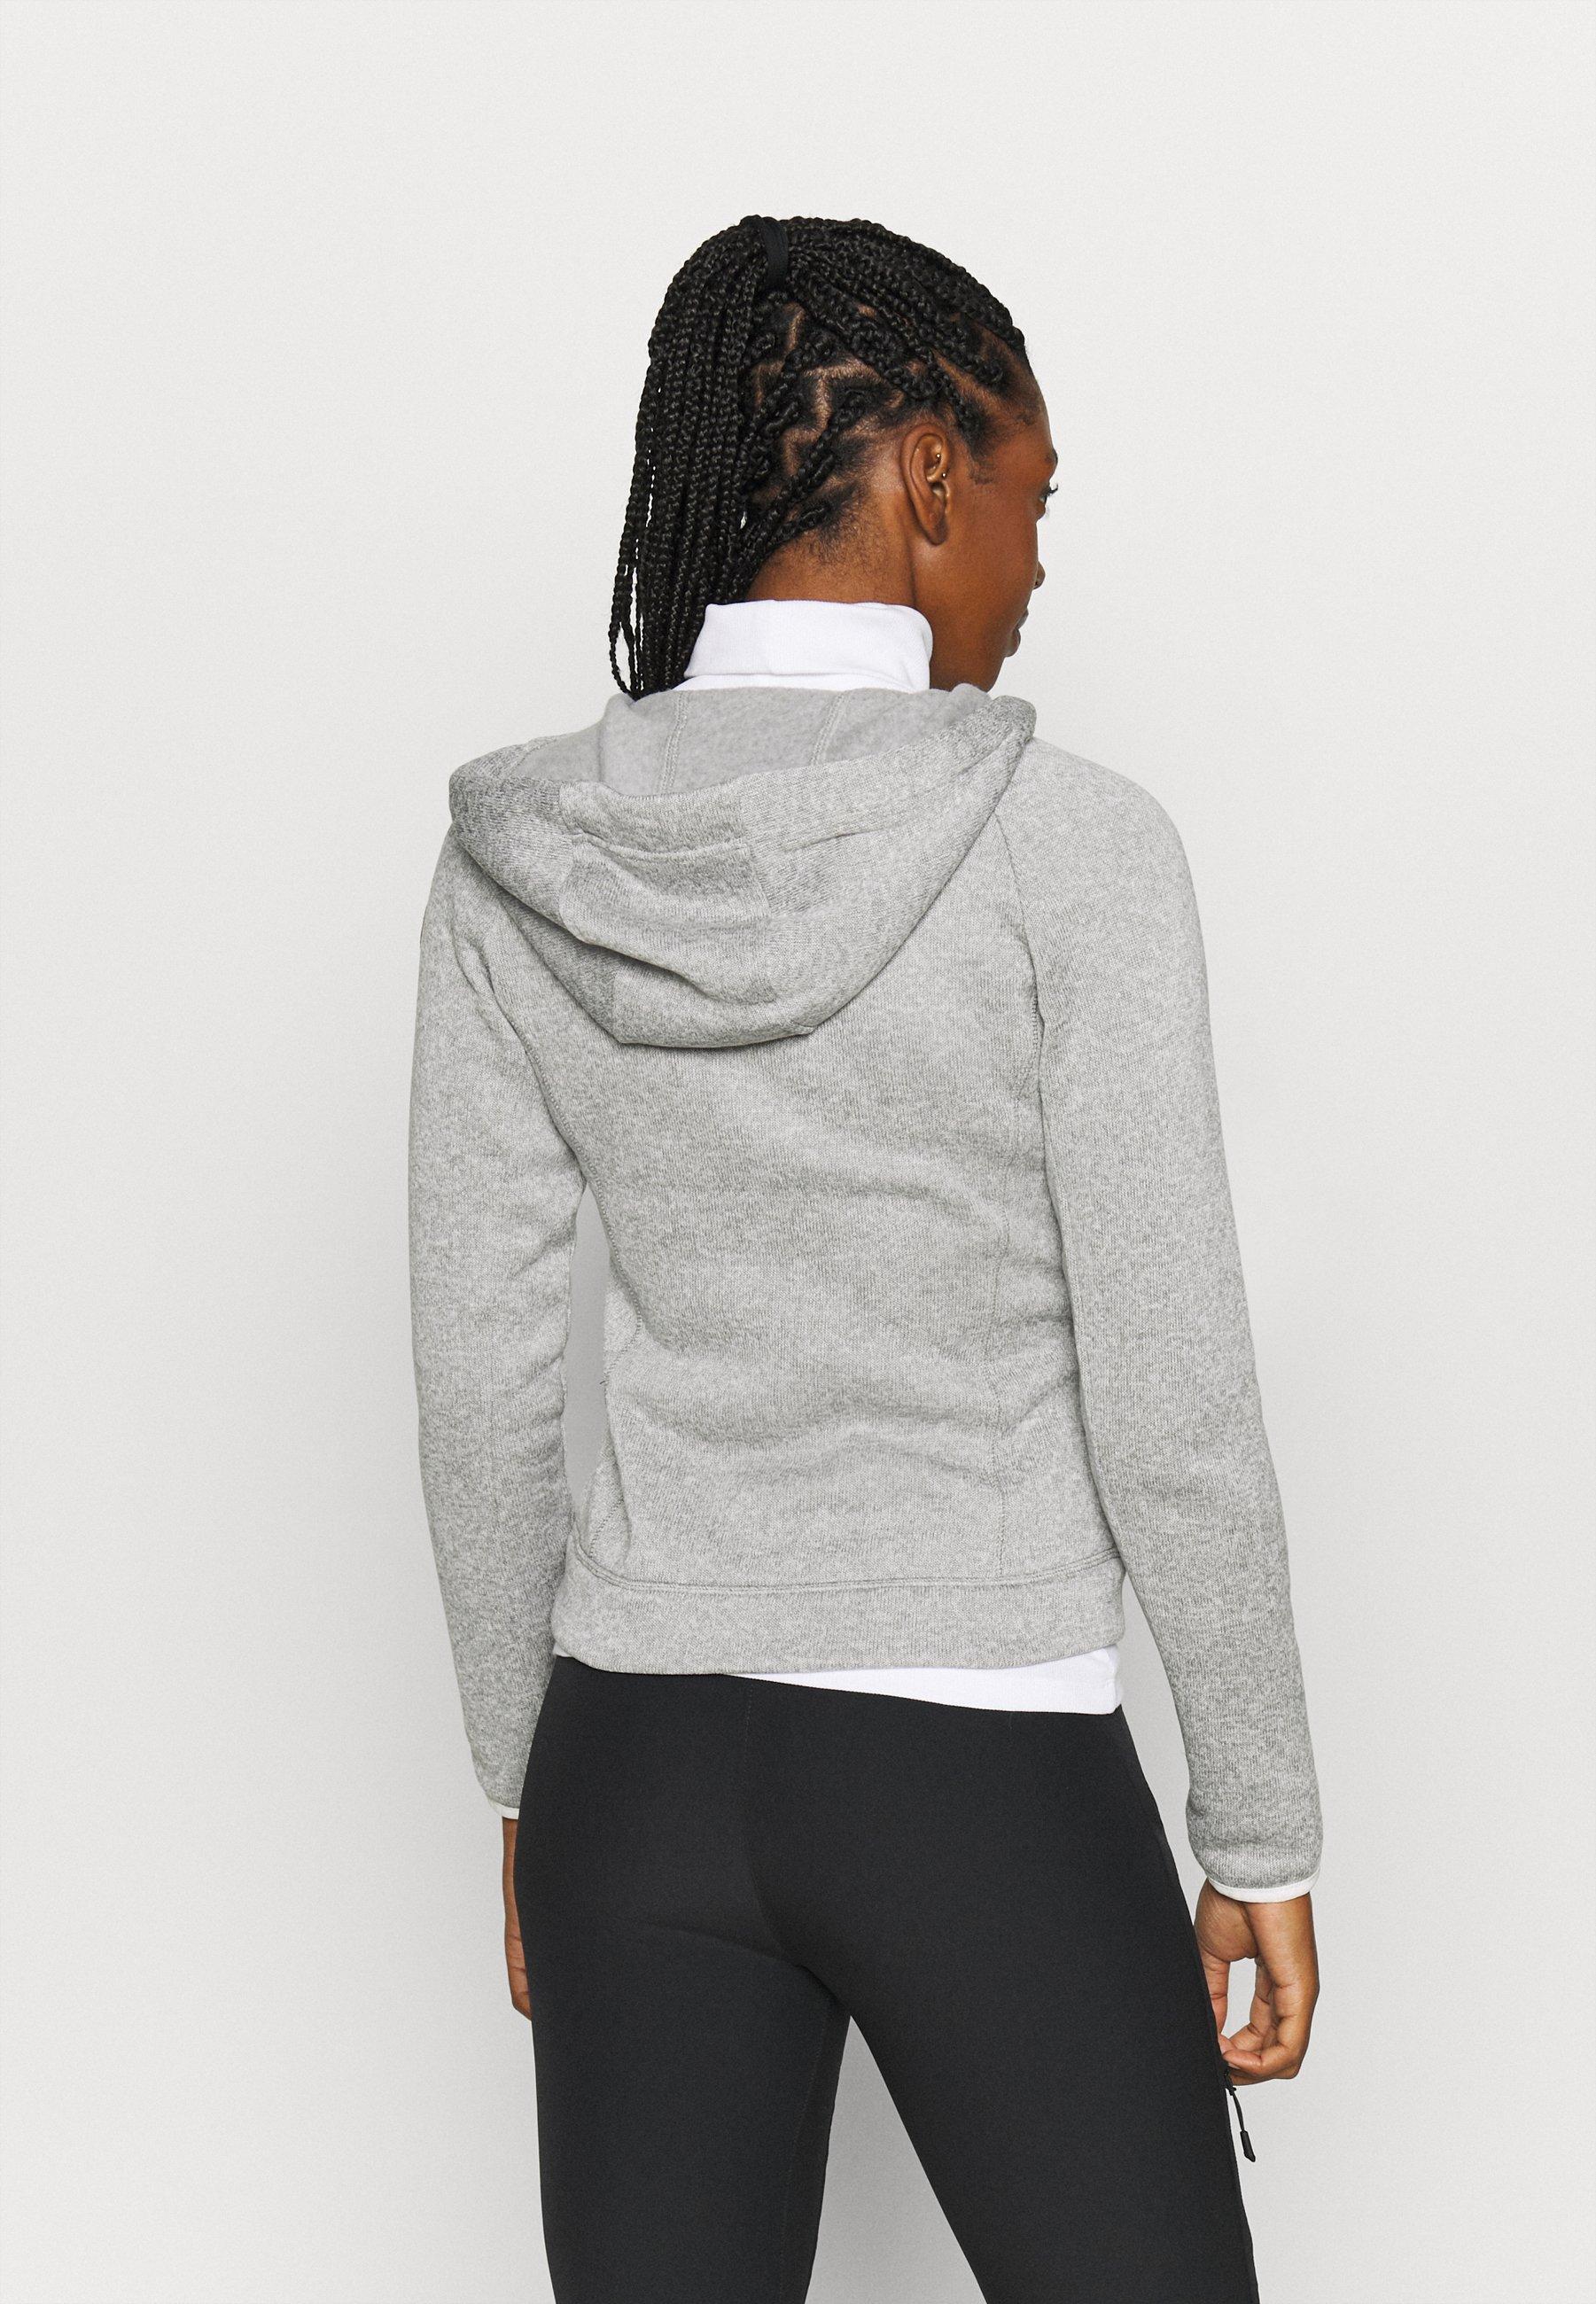 Icepeak AUBURN - Fleece jacket - grey 6Rg62